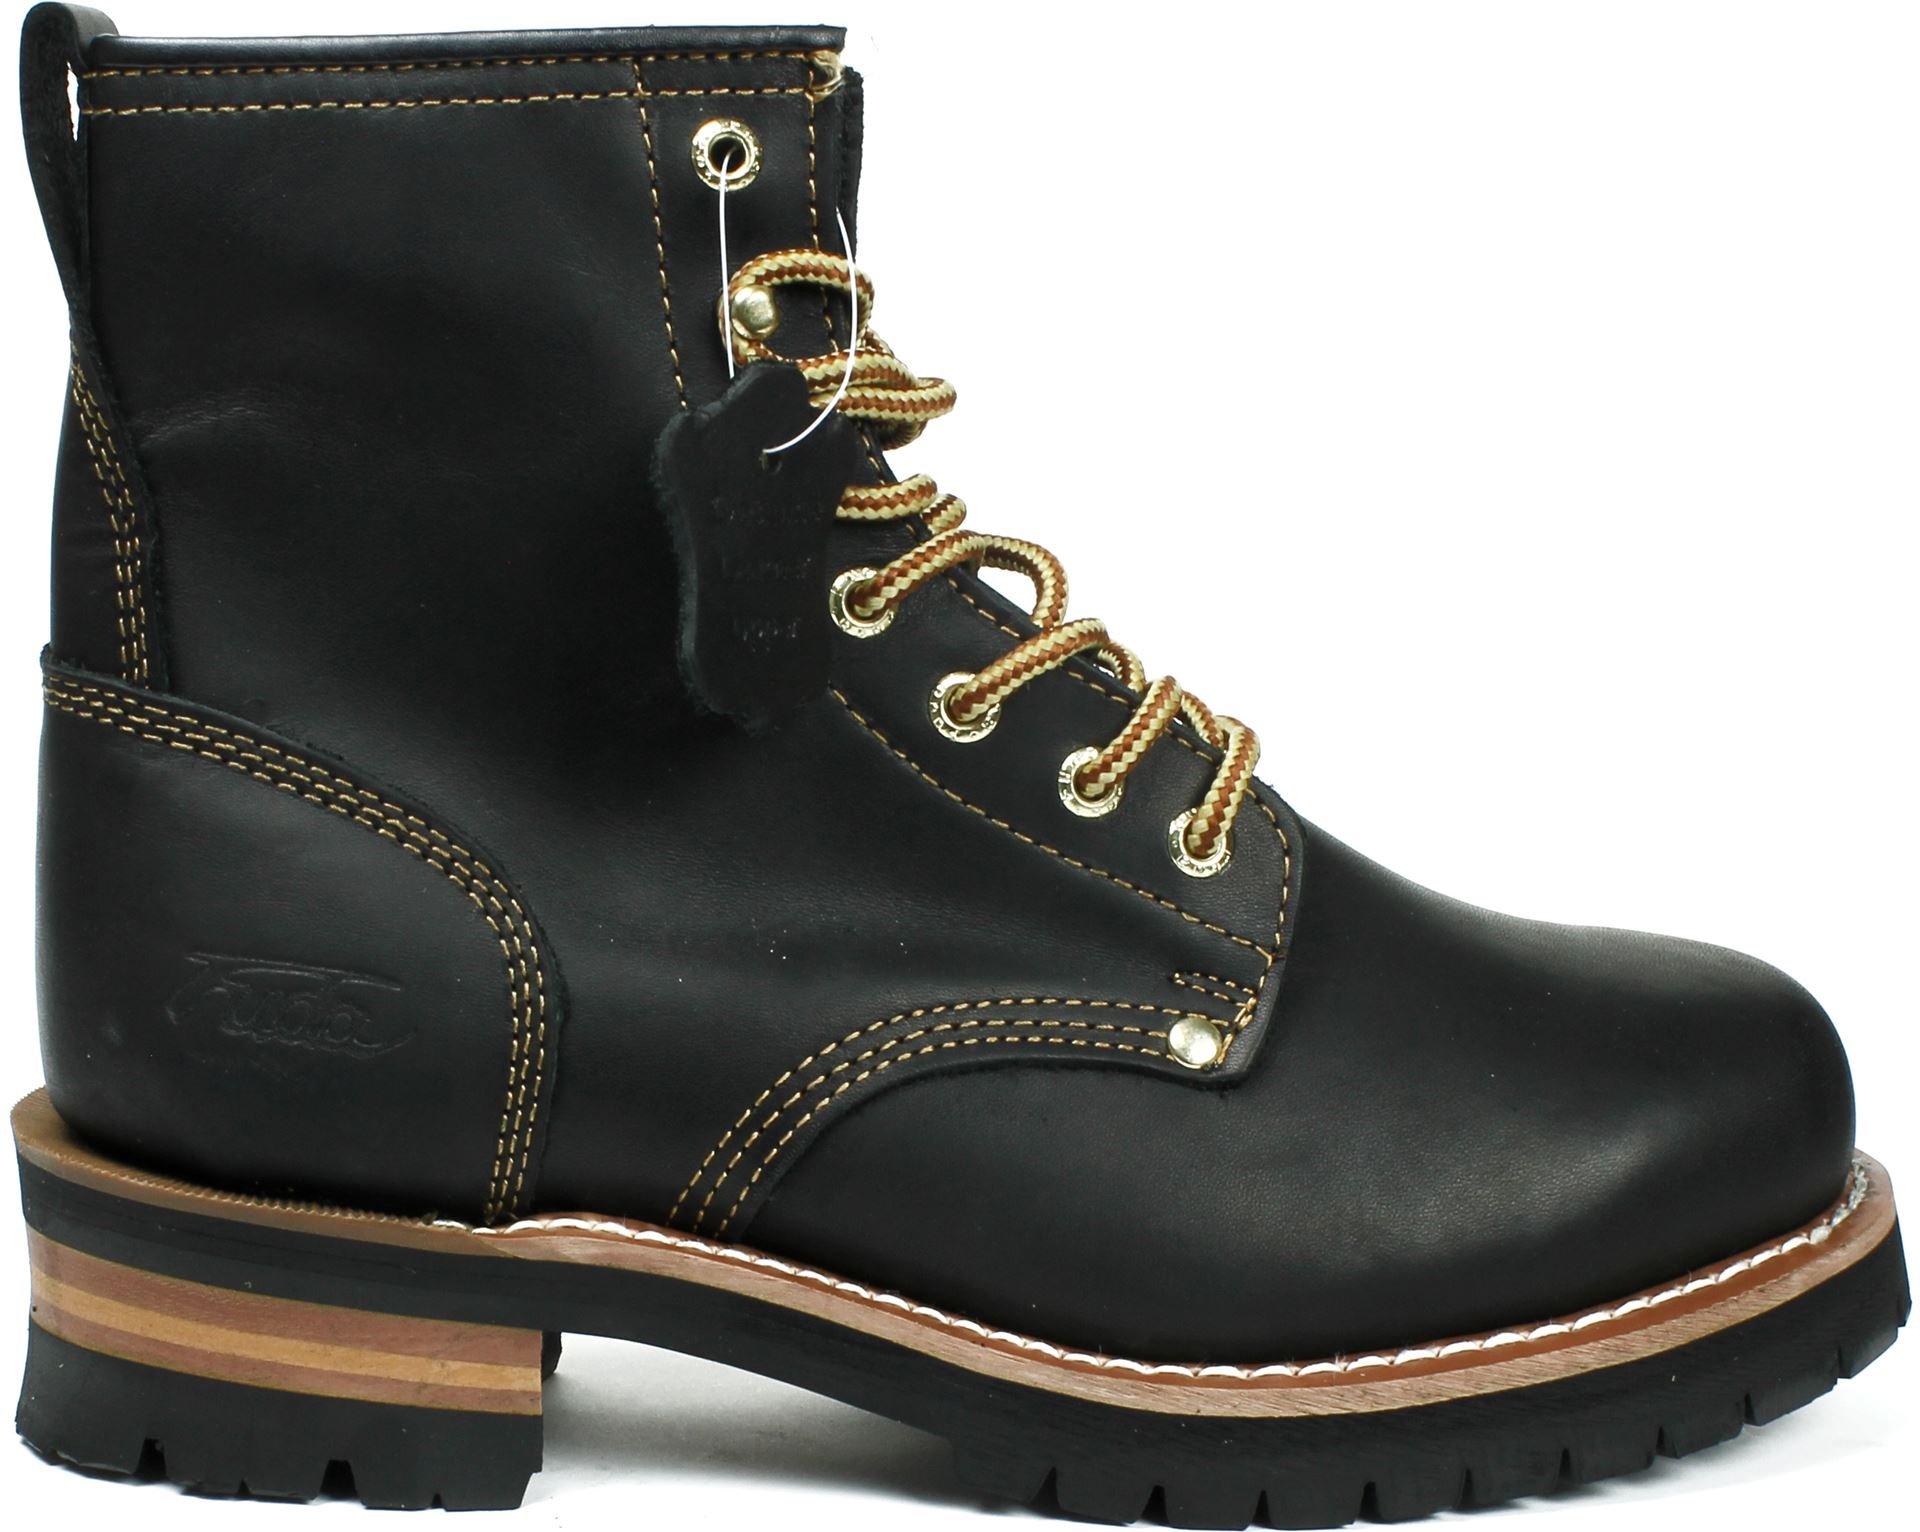 LABO Fuda Men's Leather Working Boot - 692-BLACK-10